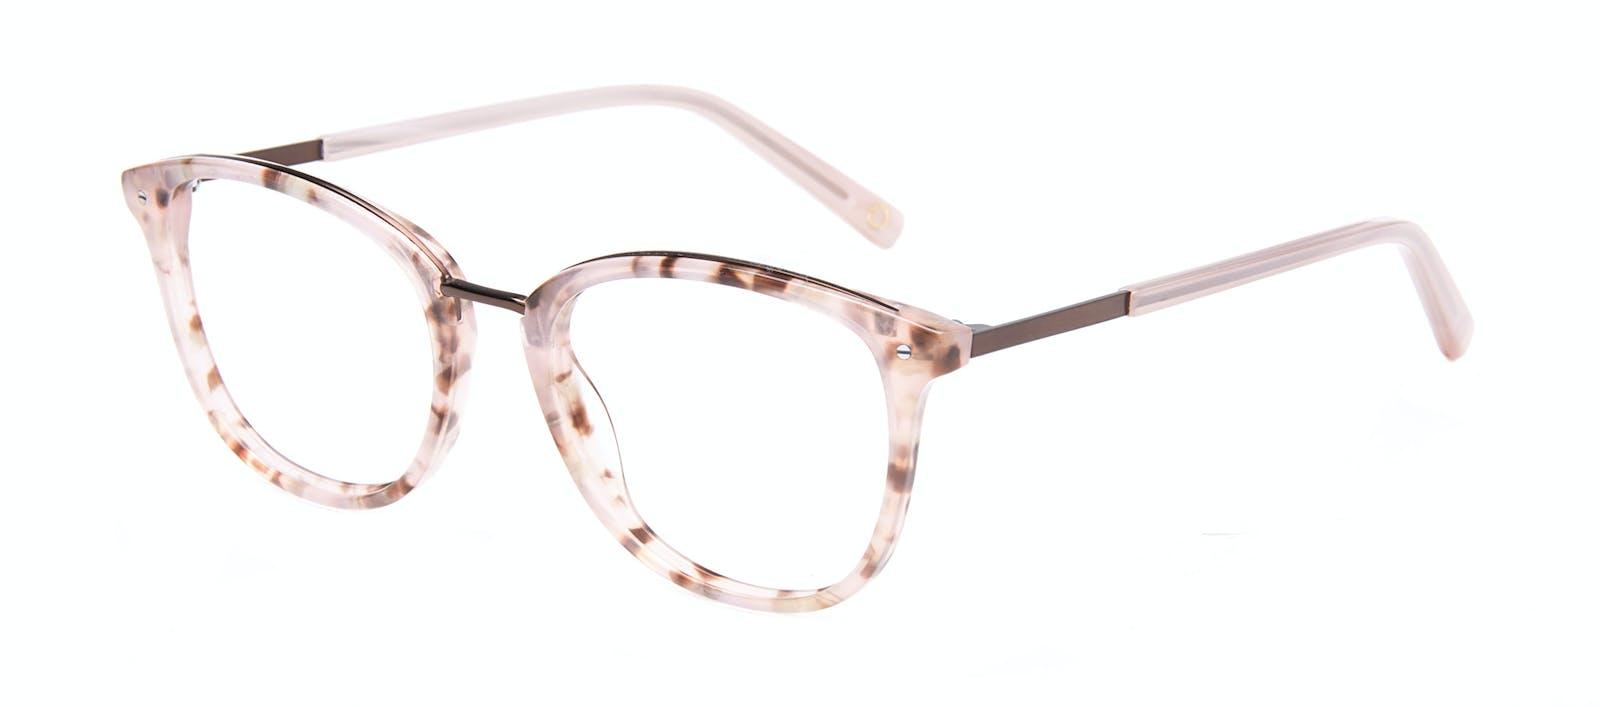 8c911a45bf Affordable Fashion Glasses Square Round Eyeglasses Women Bella Blush Tortie  Tilt